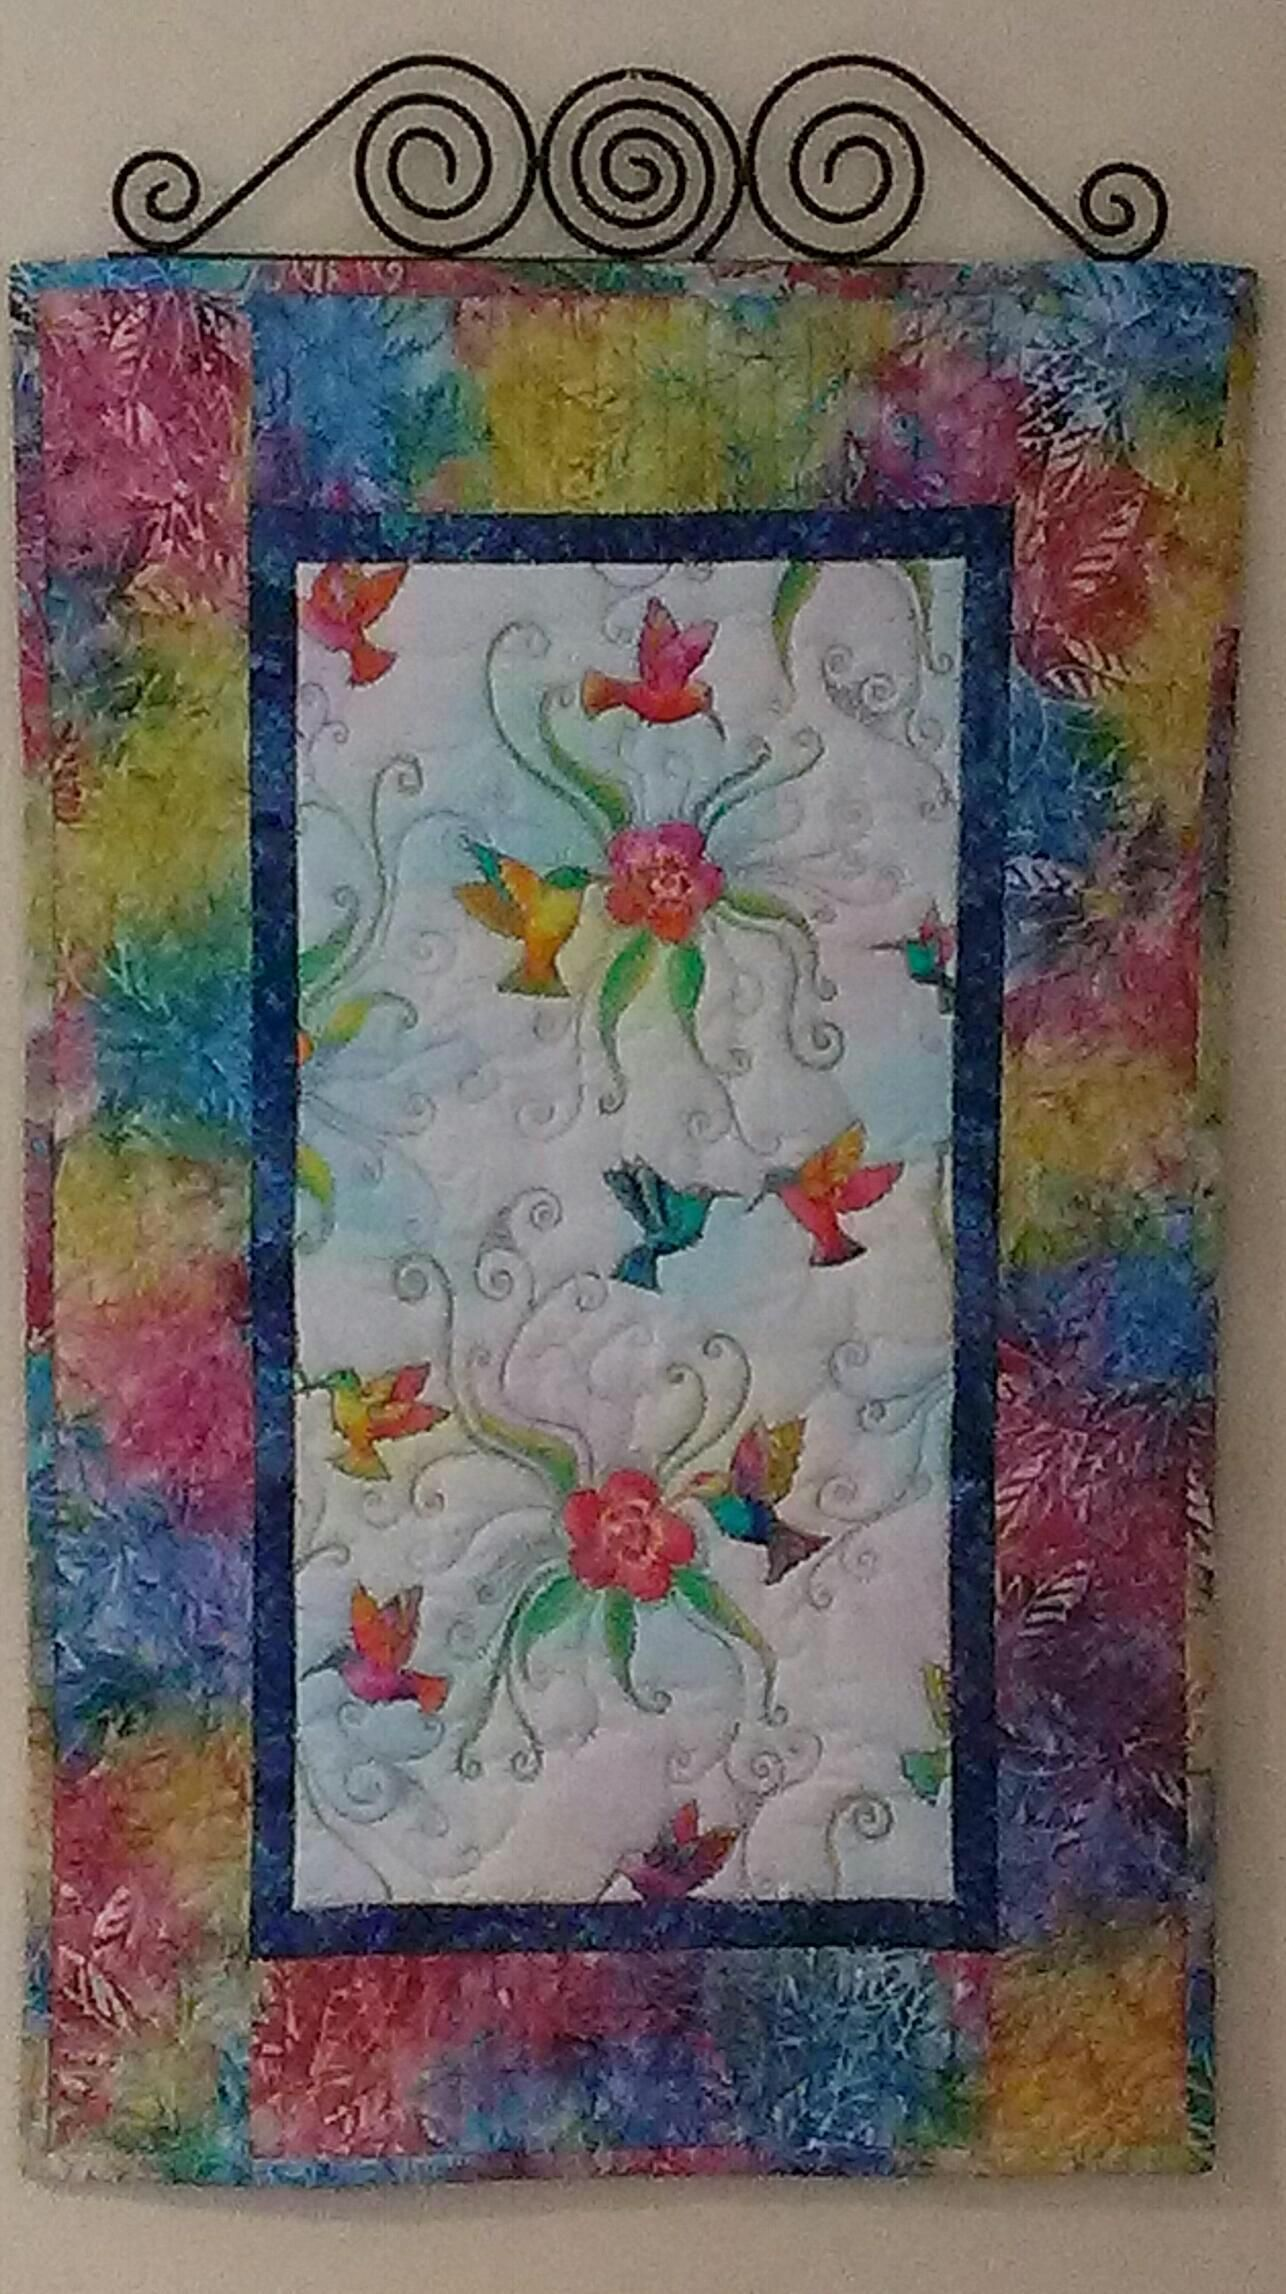 Handmade hummingbirdbatik wall hanging freemotion quilted my